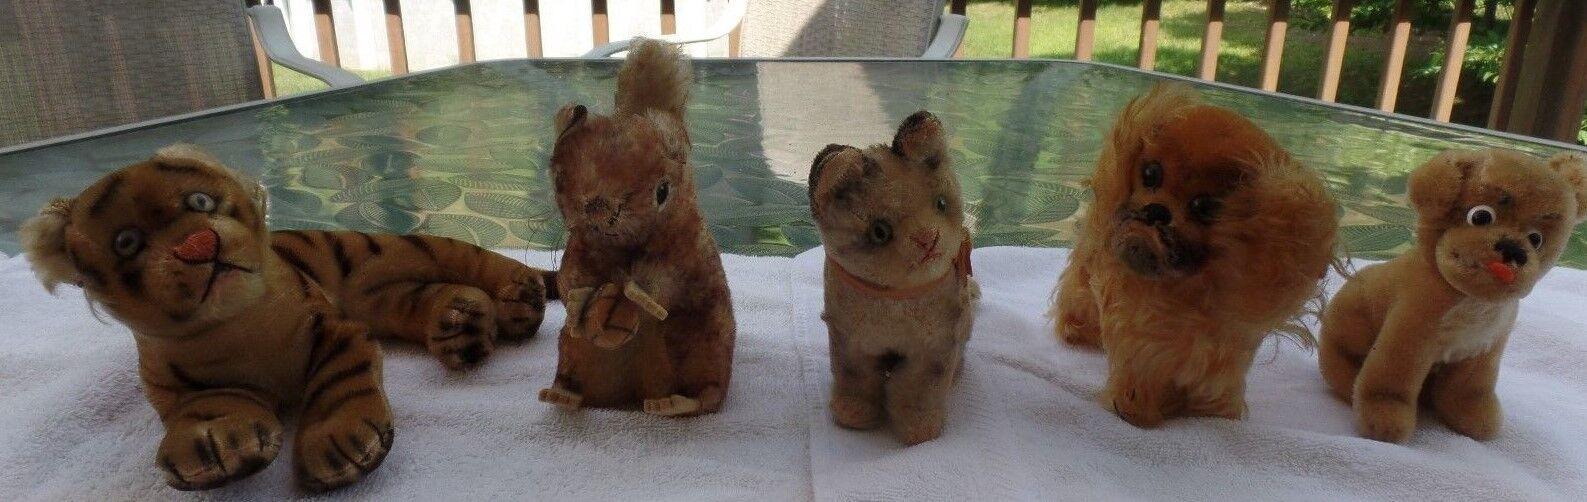 Lot of 5 Five Antique Vintage German STEIFF Bulldog Cat Pekinese Tiger Squirrel